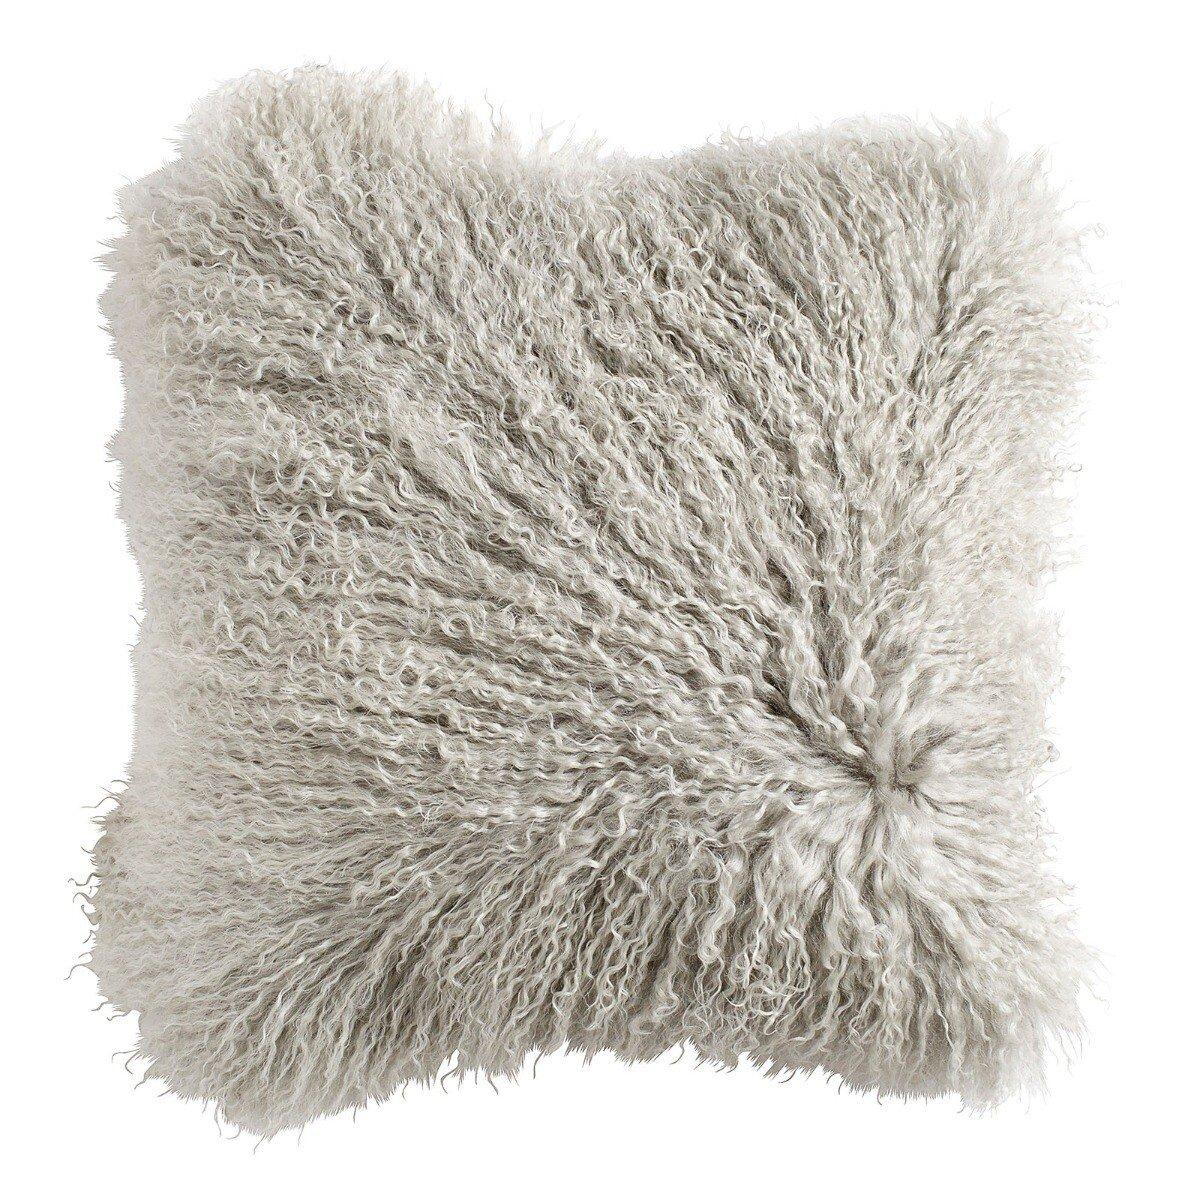 Nordal kussenhoes schapenvacht grijs 40 x 40